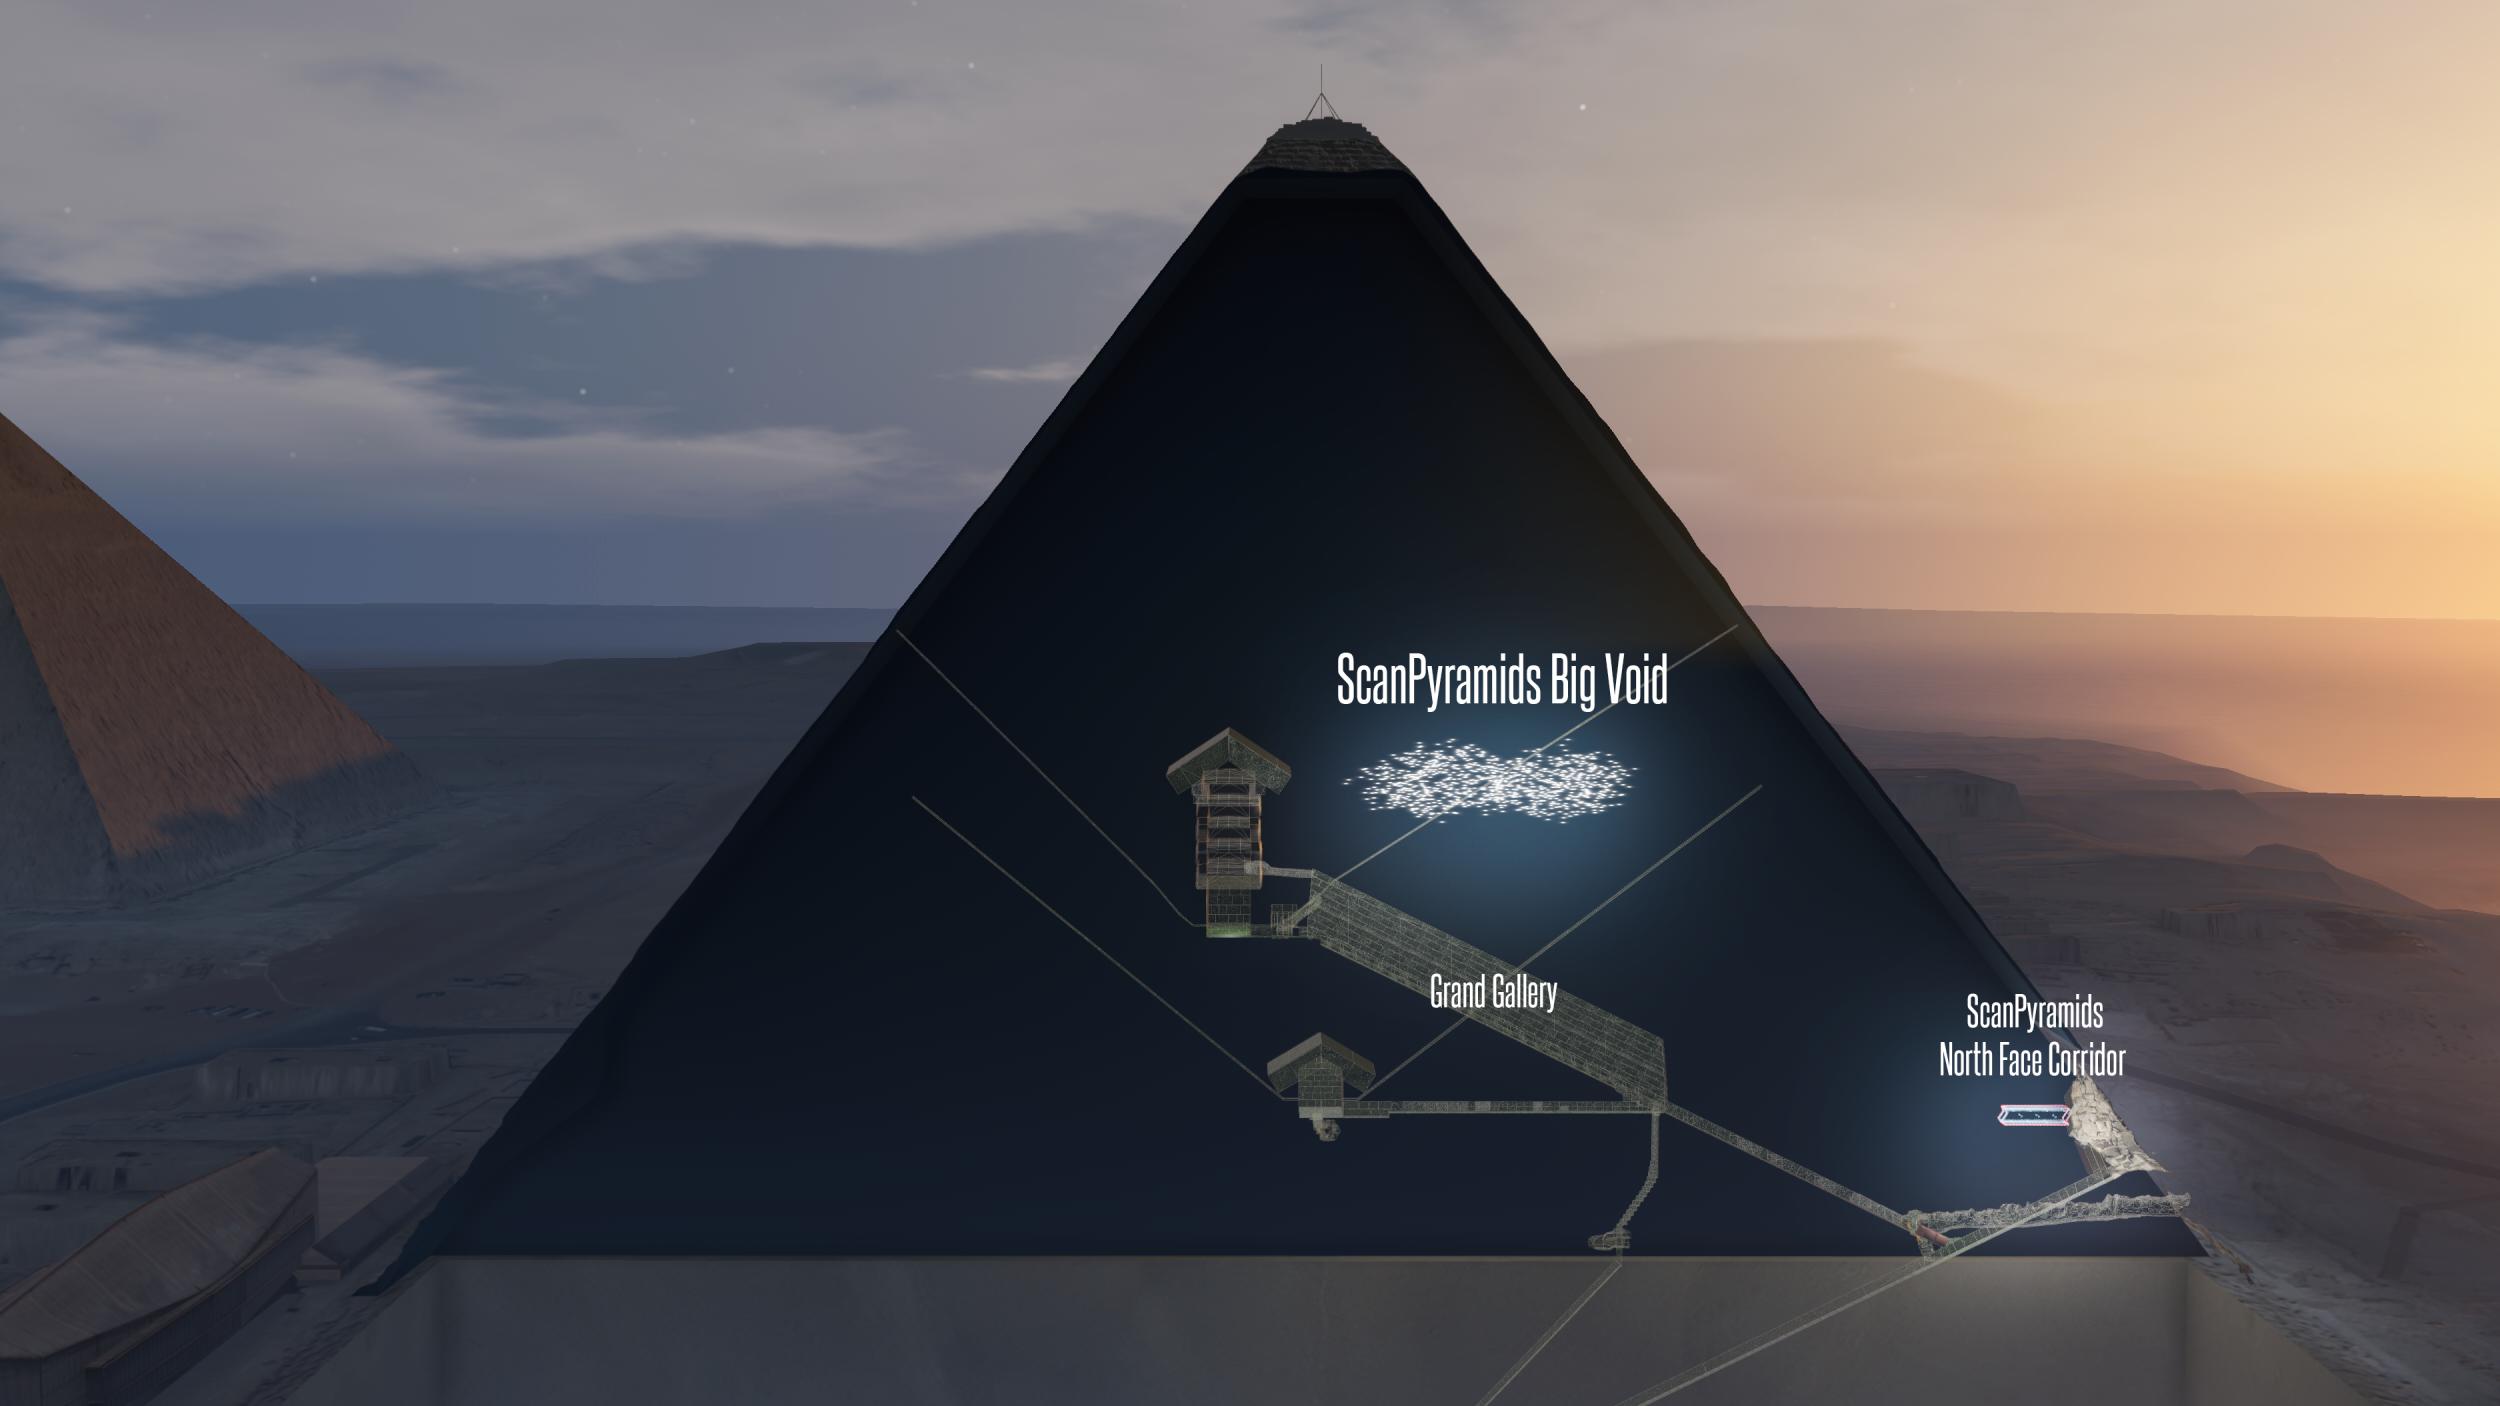 ScanPyramids-Big-Void-3D-Artistic-view-horizontal-option